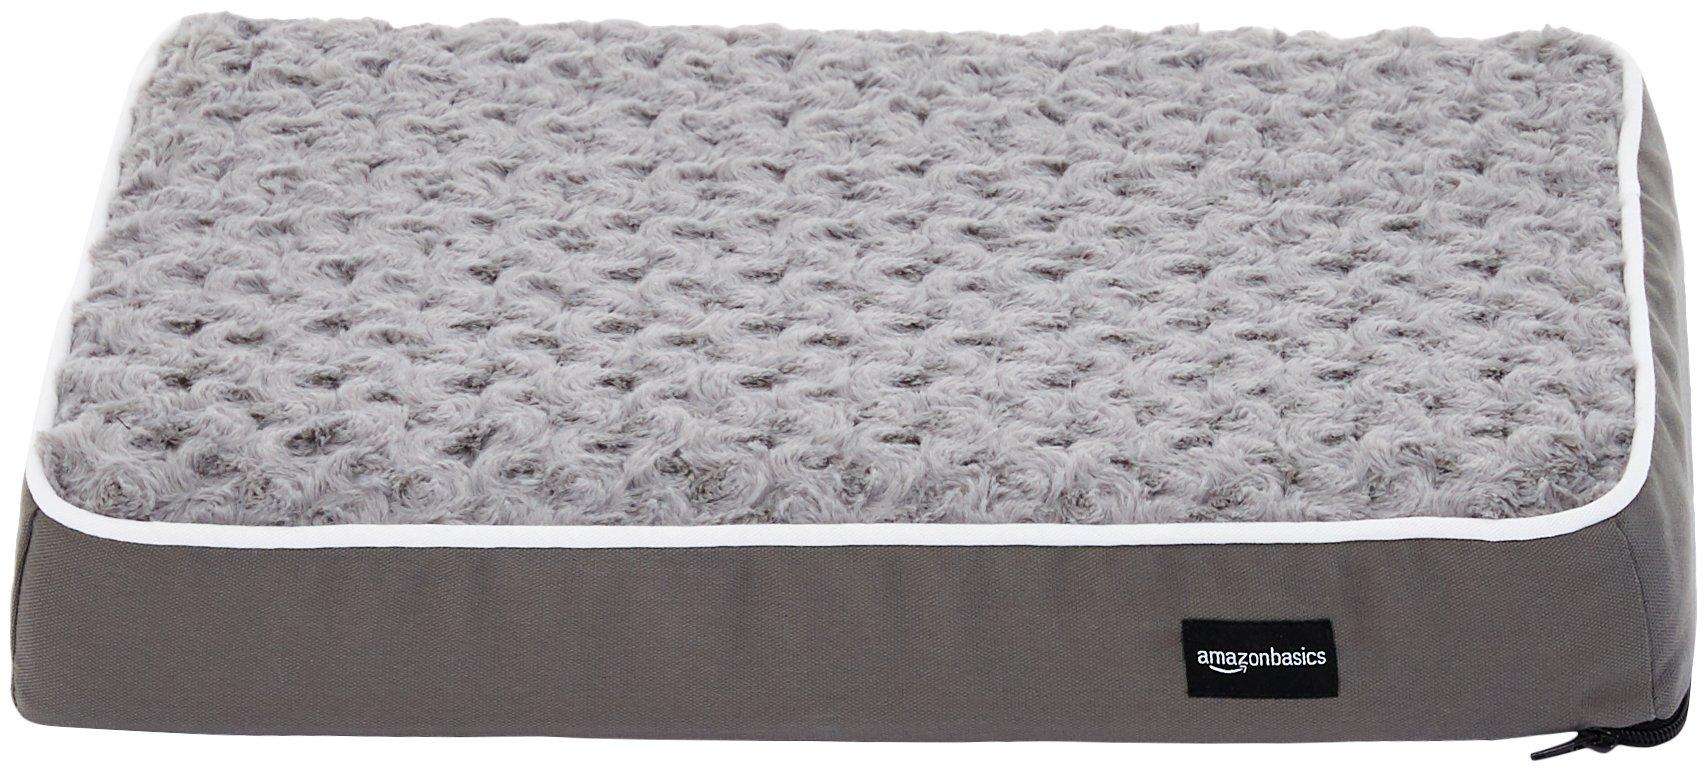 Amazon Basics Ergonomic Foam Pet Bed For Cats or Dogs